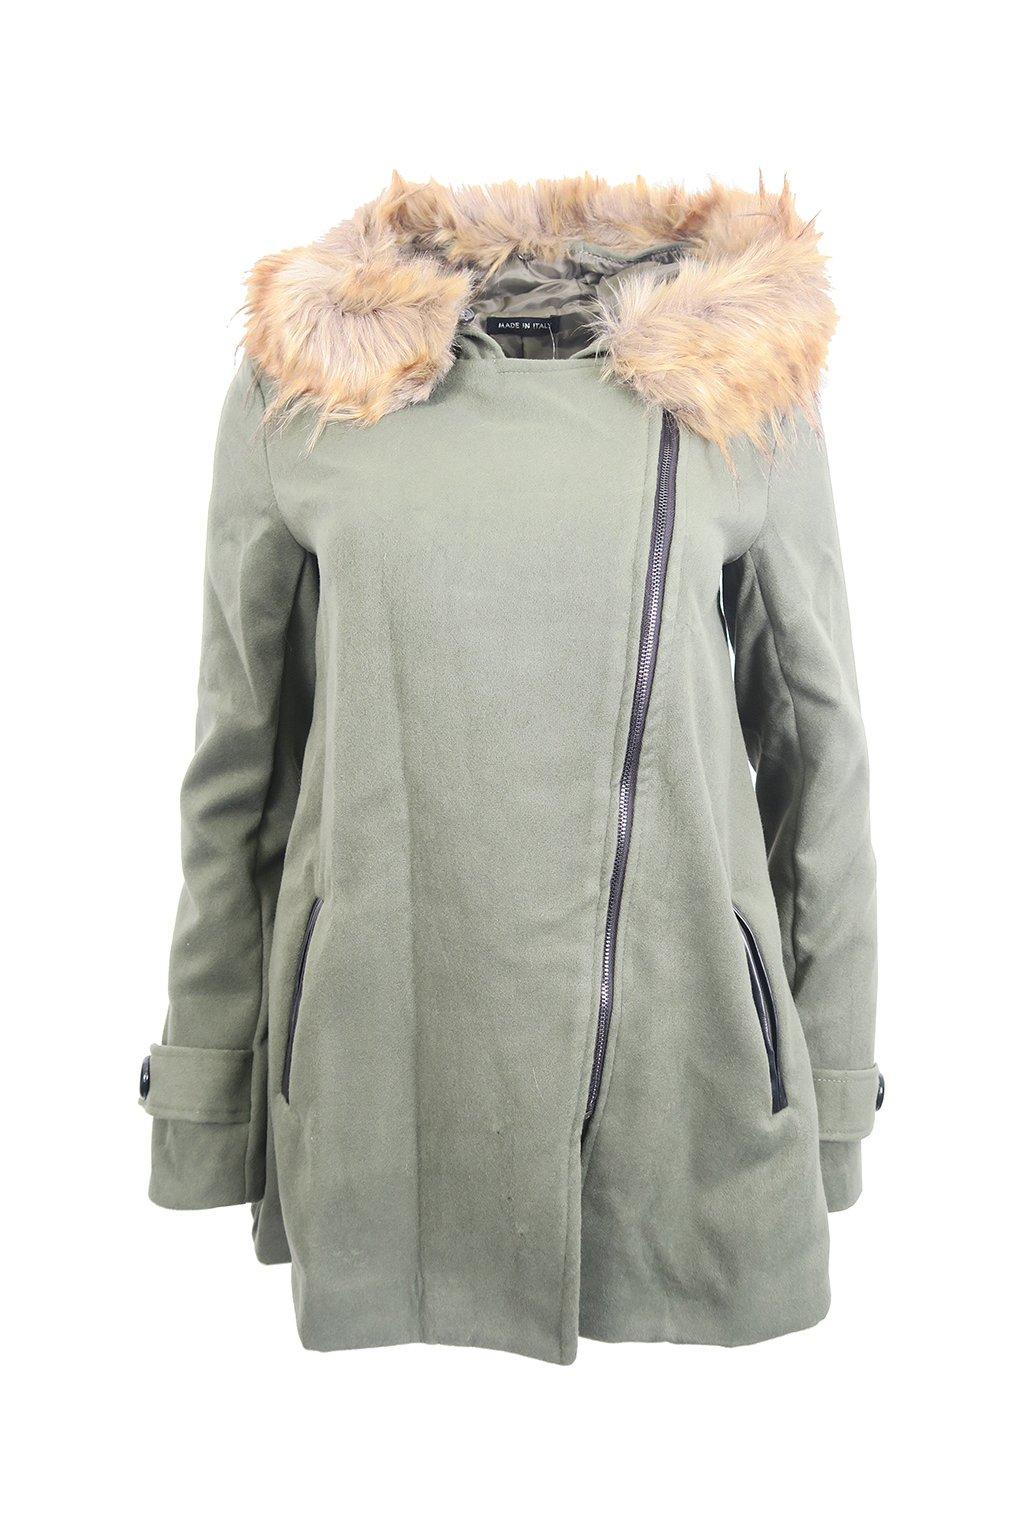 d6cdd75f6b Khaki kabátek Made in Italy - BERTOO